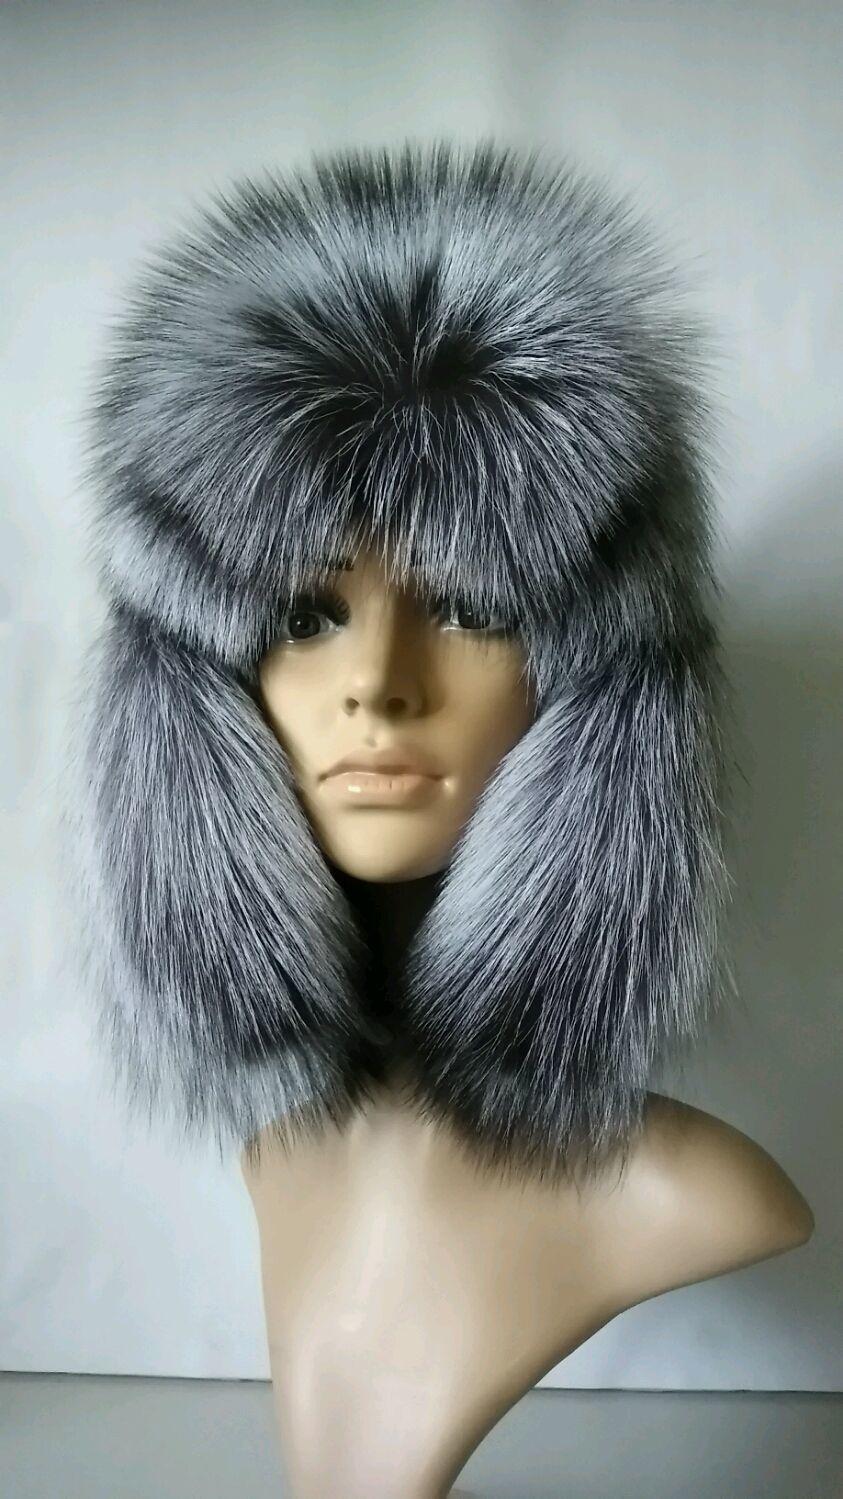 карманные шапка тамерлан с чернобуркой фото крыльцо необходимо